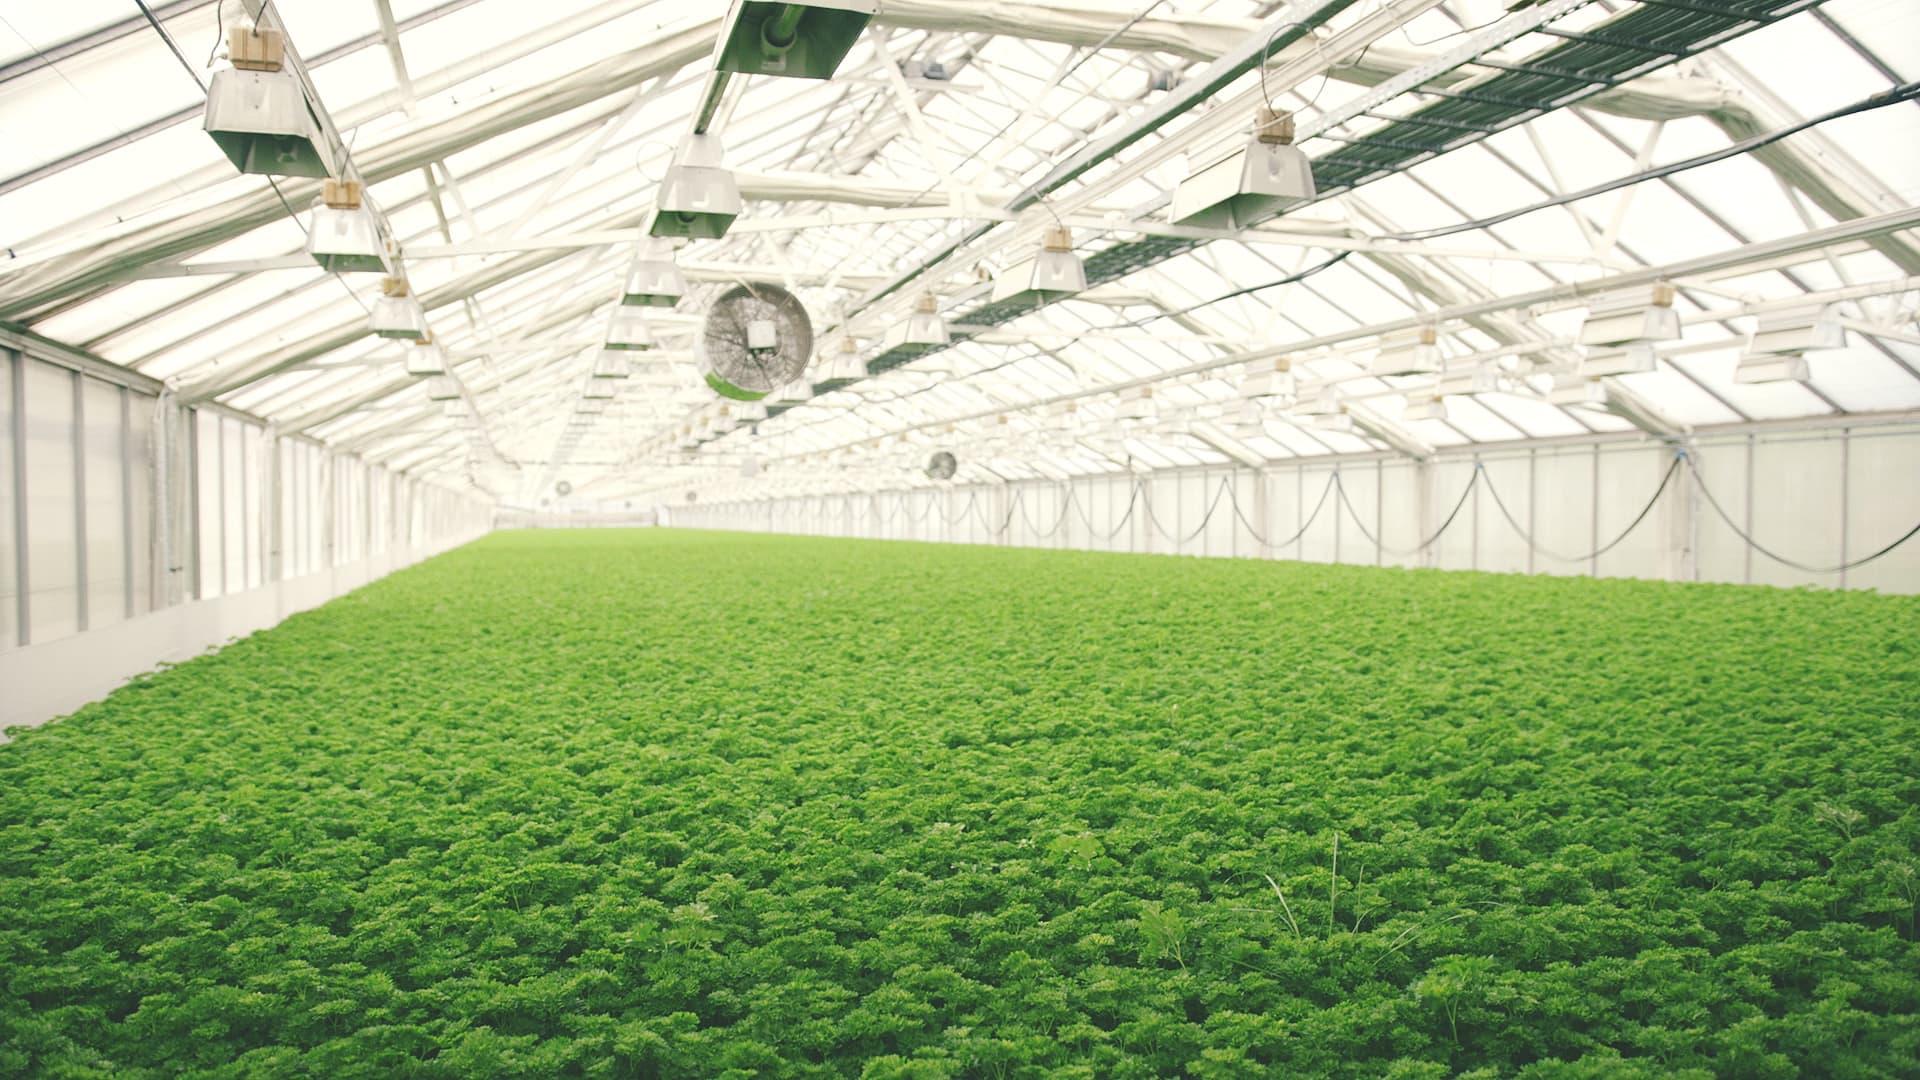 Snarum gartneri er 8000 kvadratmeter med planter helt fri for sprøytemidler.